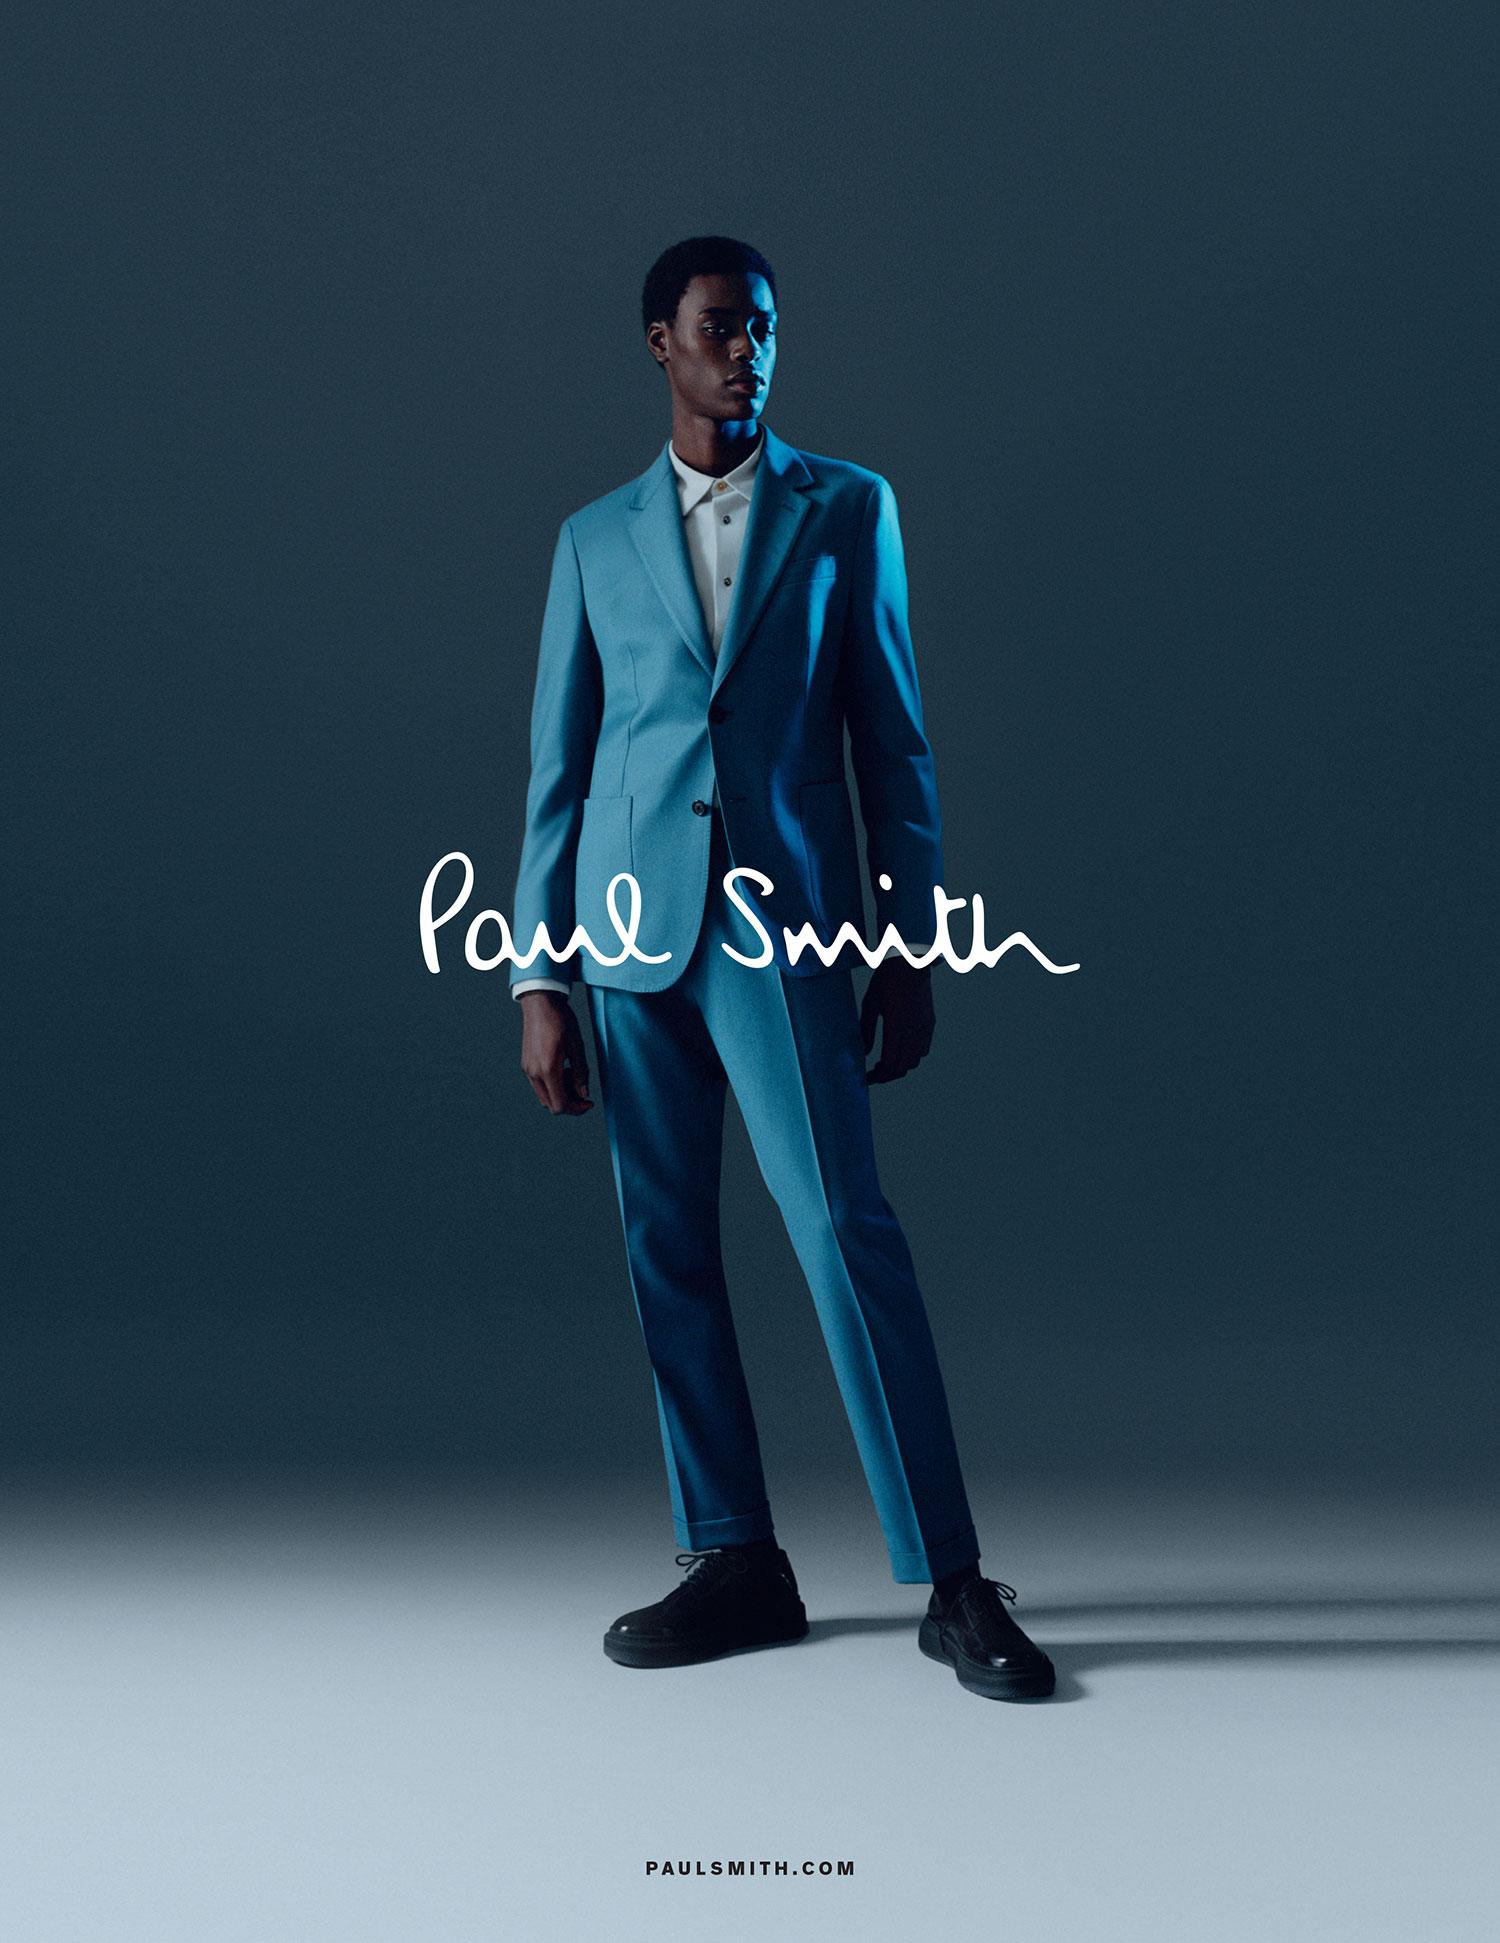 PAUL-SMITH-AW20-CAMPAIGN-BY-GREG-LIN-JIAJIE_2